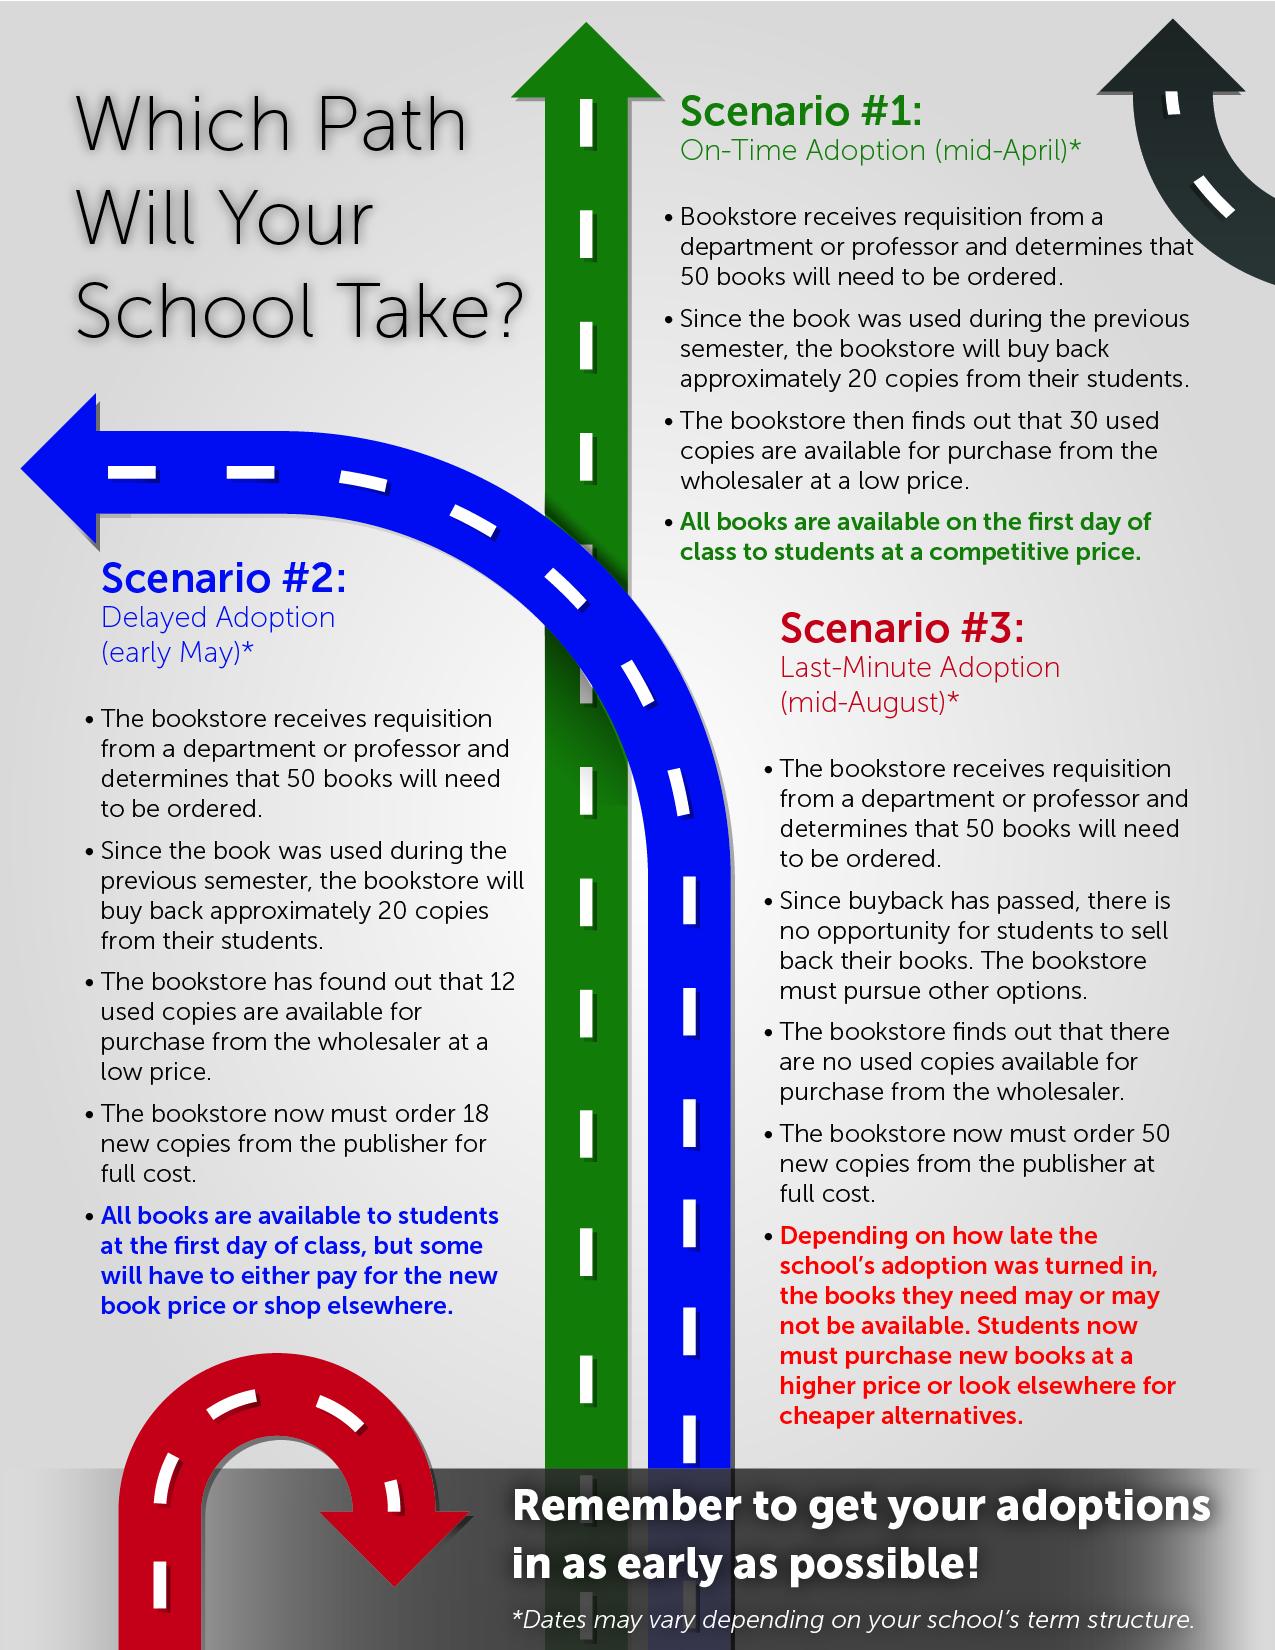 Adoptions RoadmapV2-01